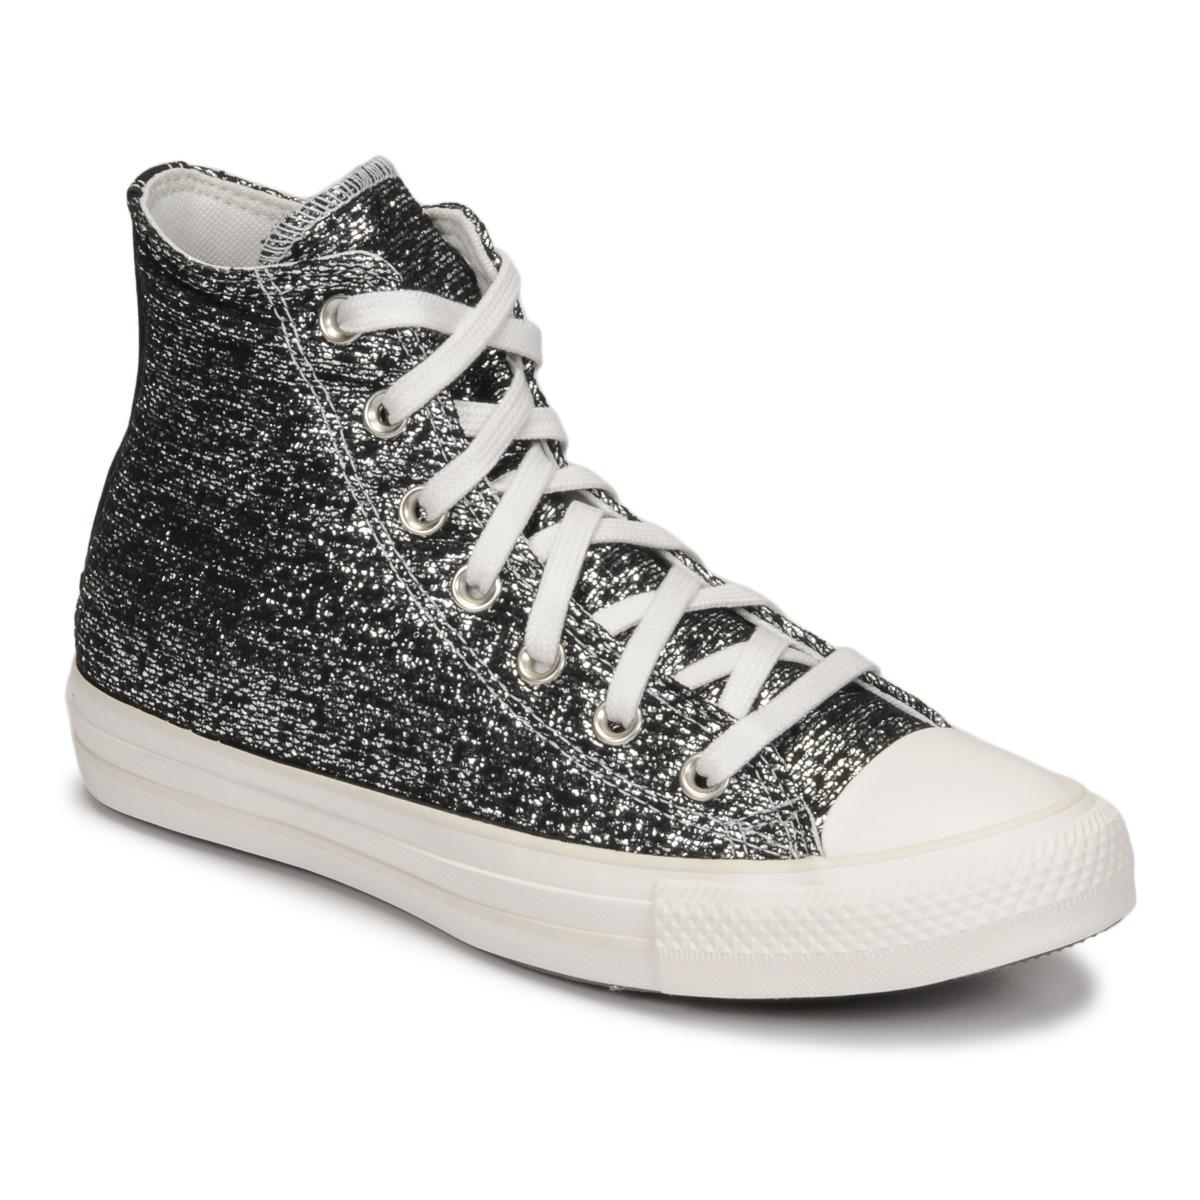 Sneakers alte donna Converse CHUCK TAYLOR ALL STAR GOLDEN REPAIR HI Nero